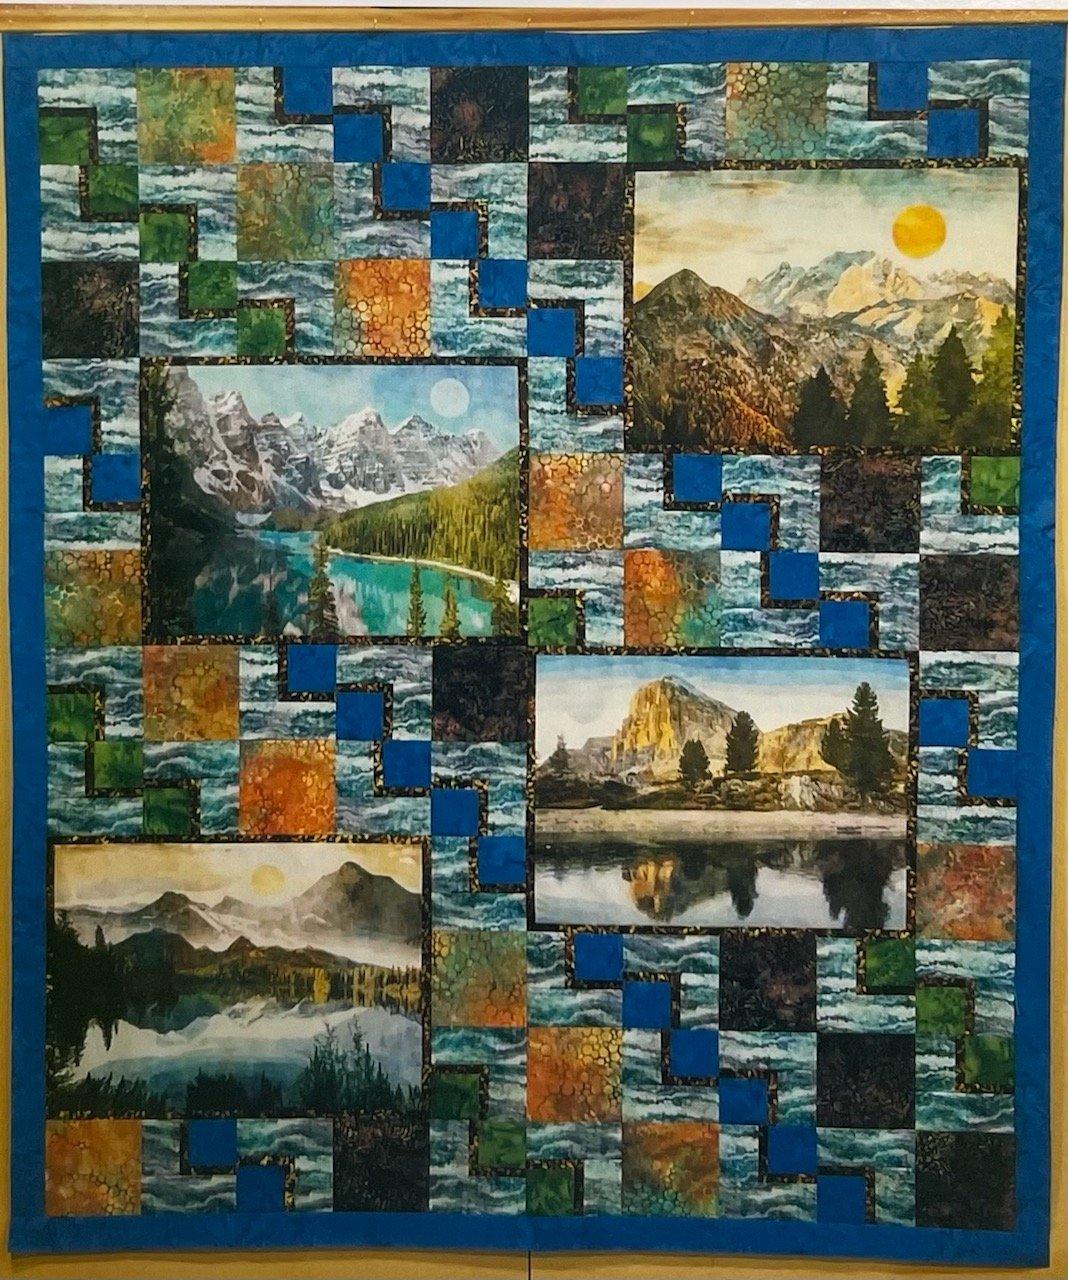 Untamed Waterscape Quilt Kit